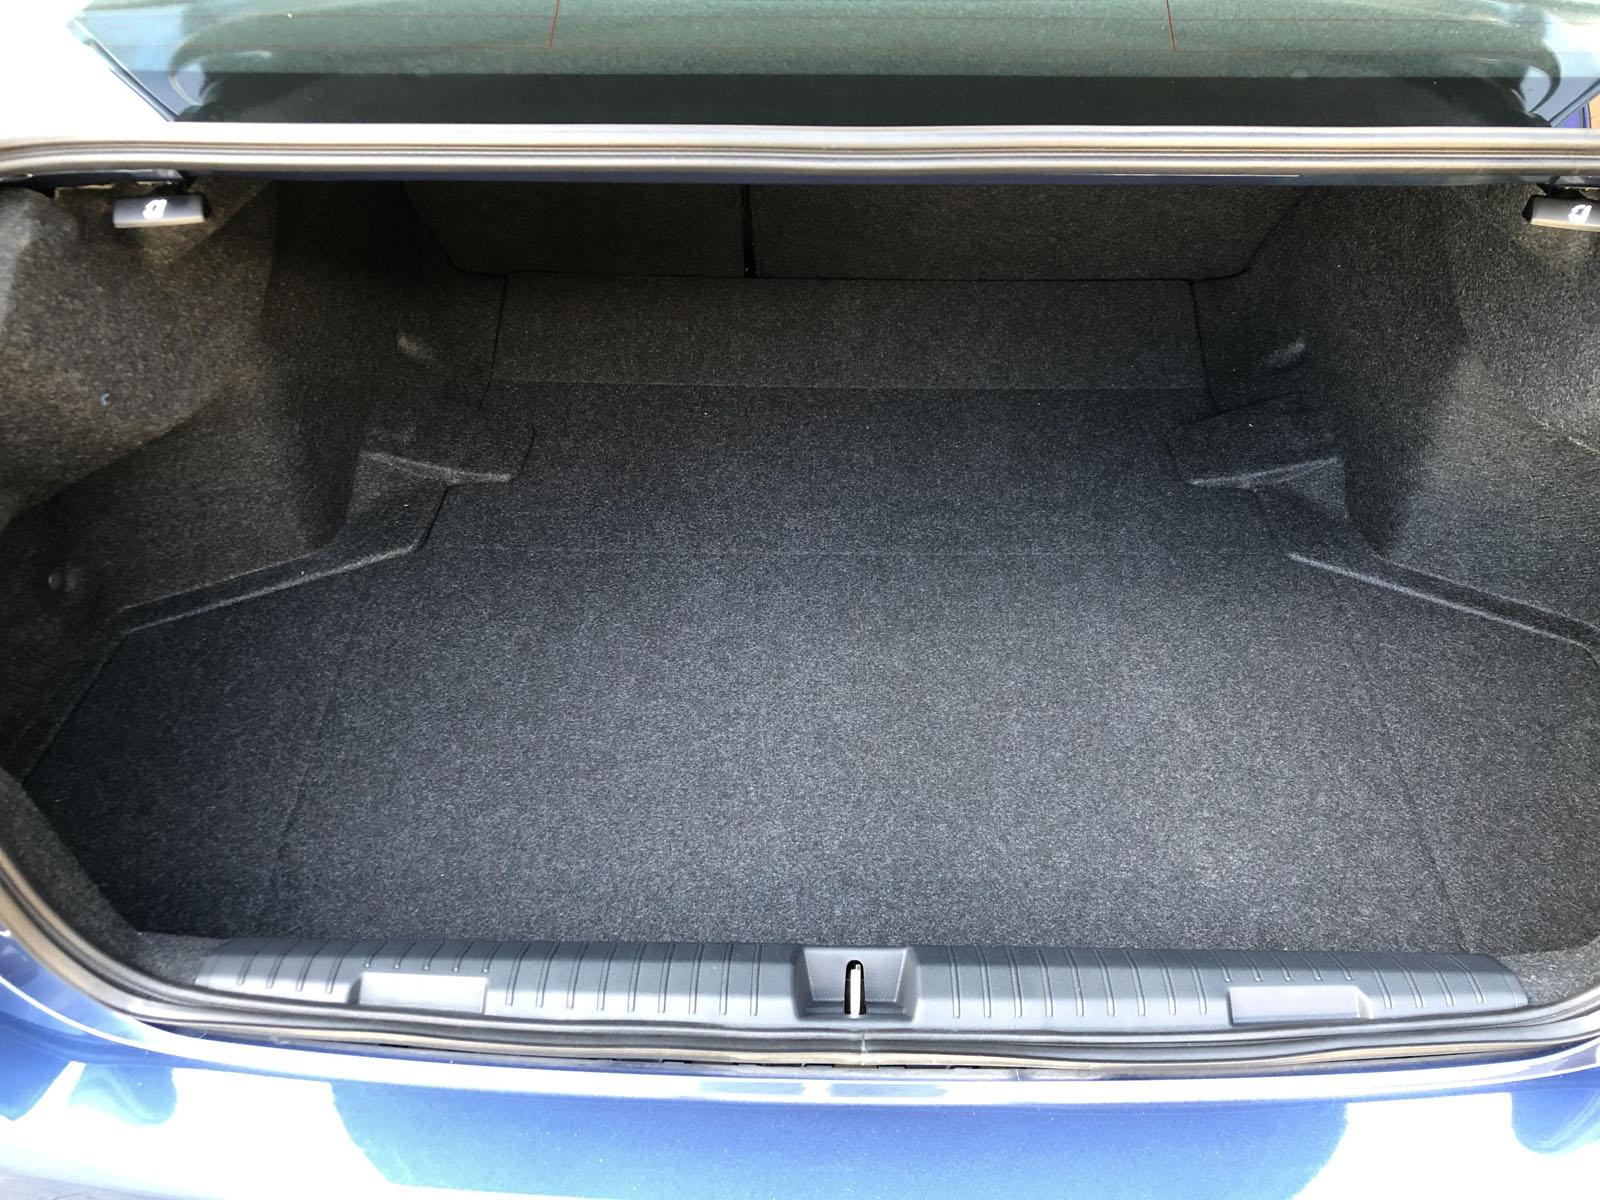 2020 Subaru Legacy trunk